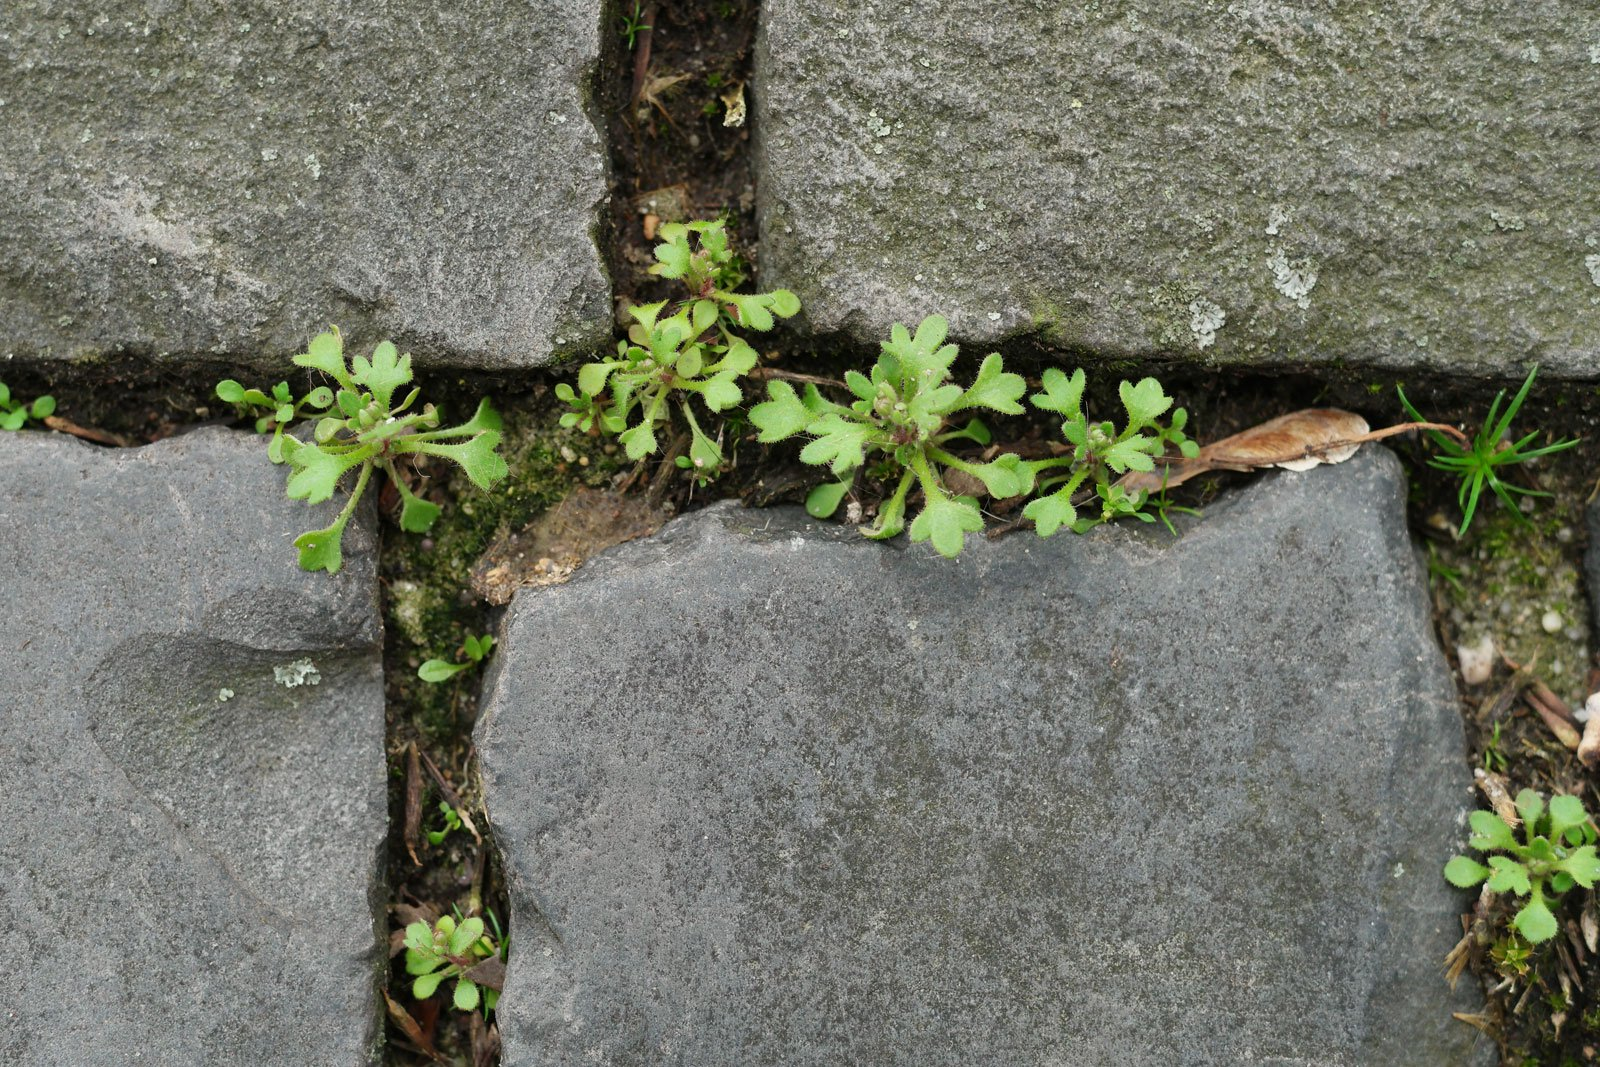 Saxifraga tridactylites